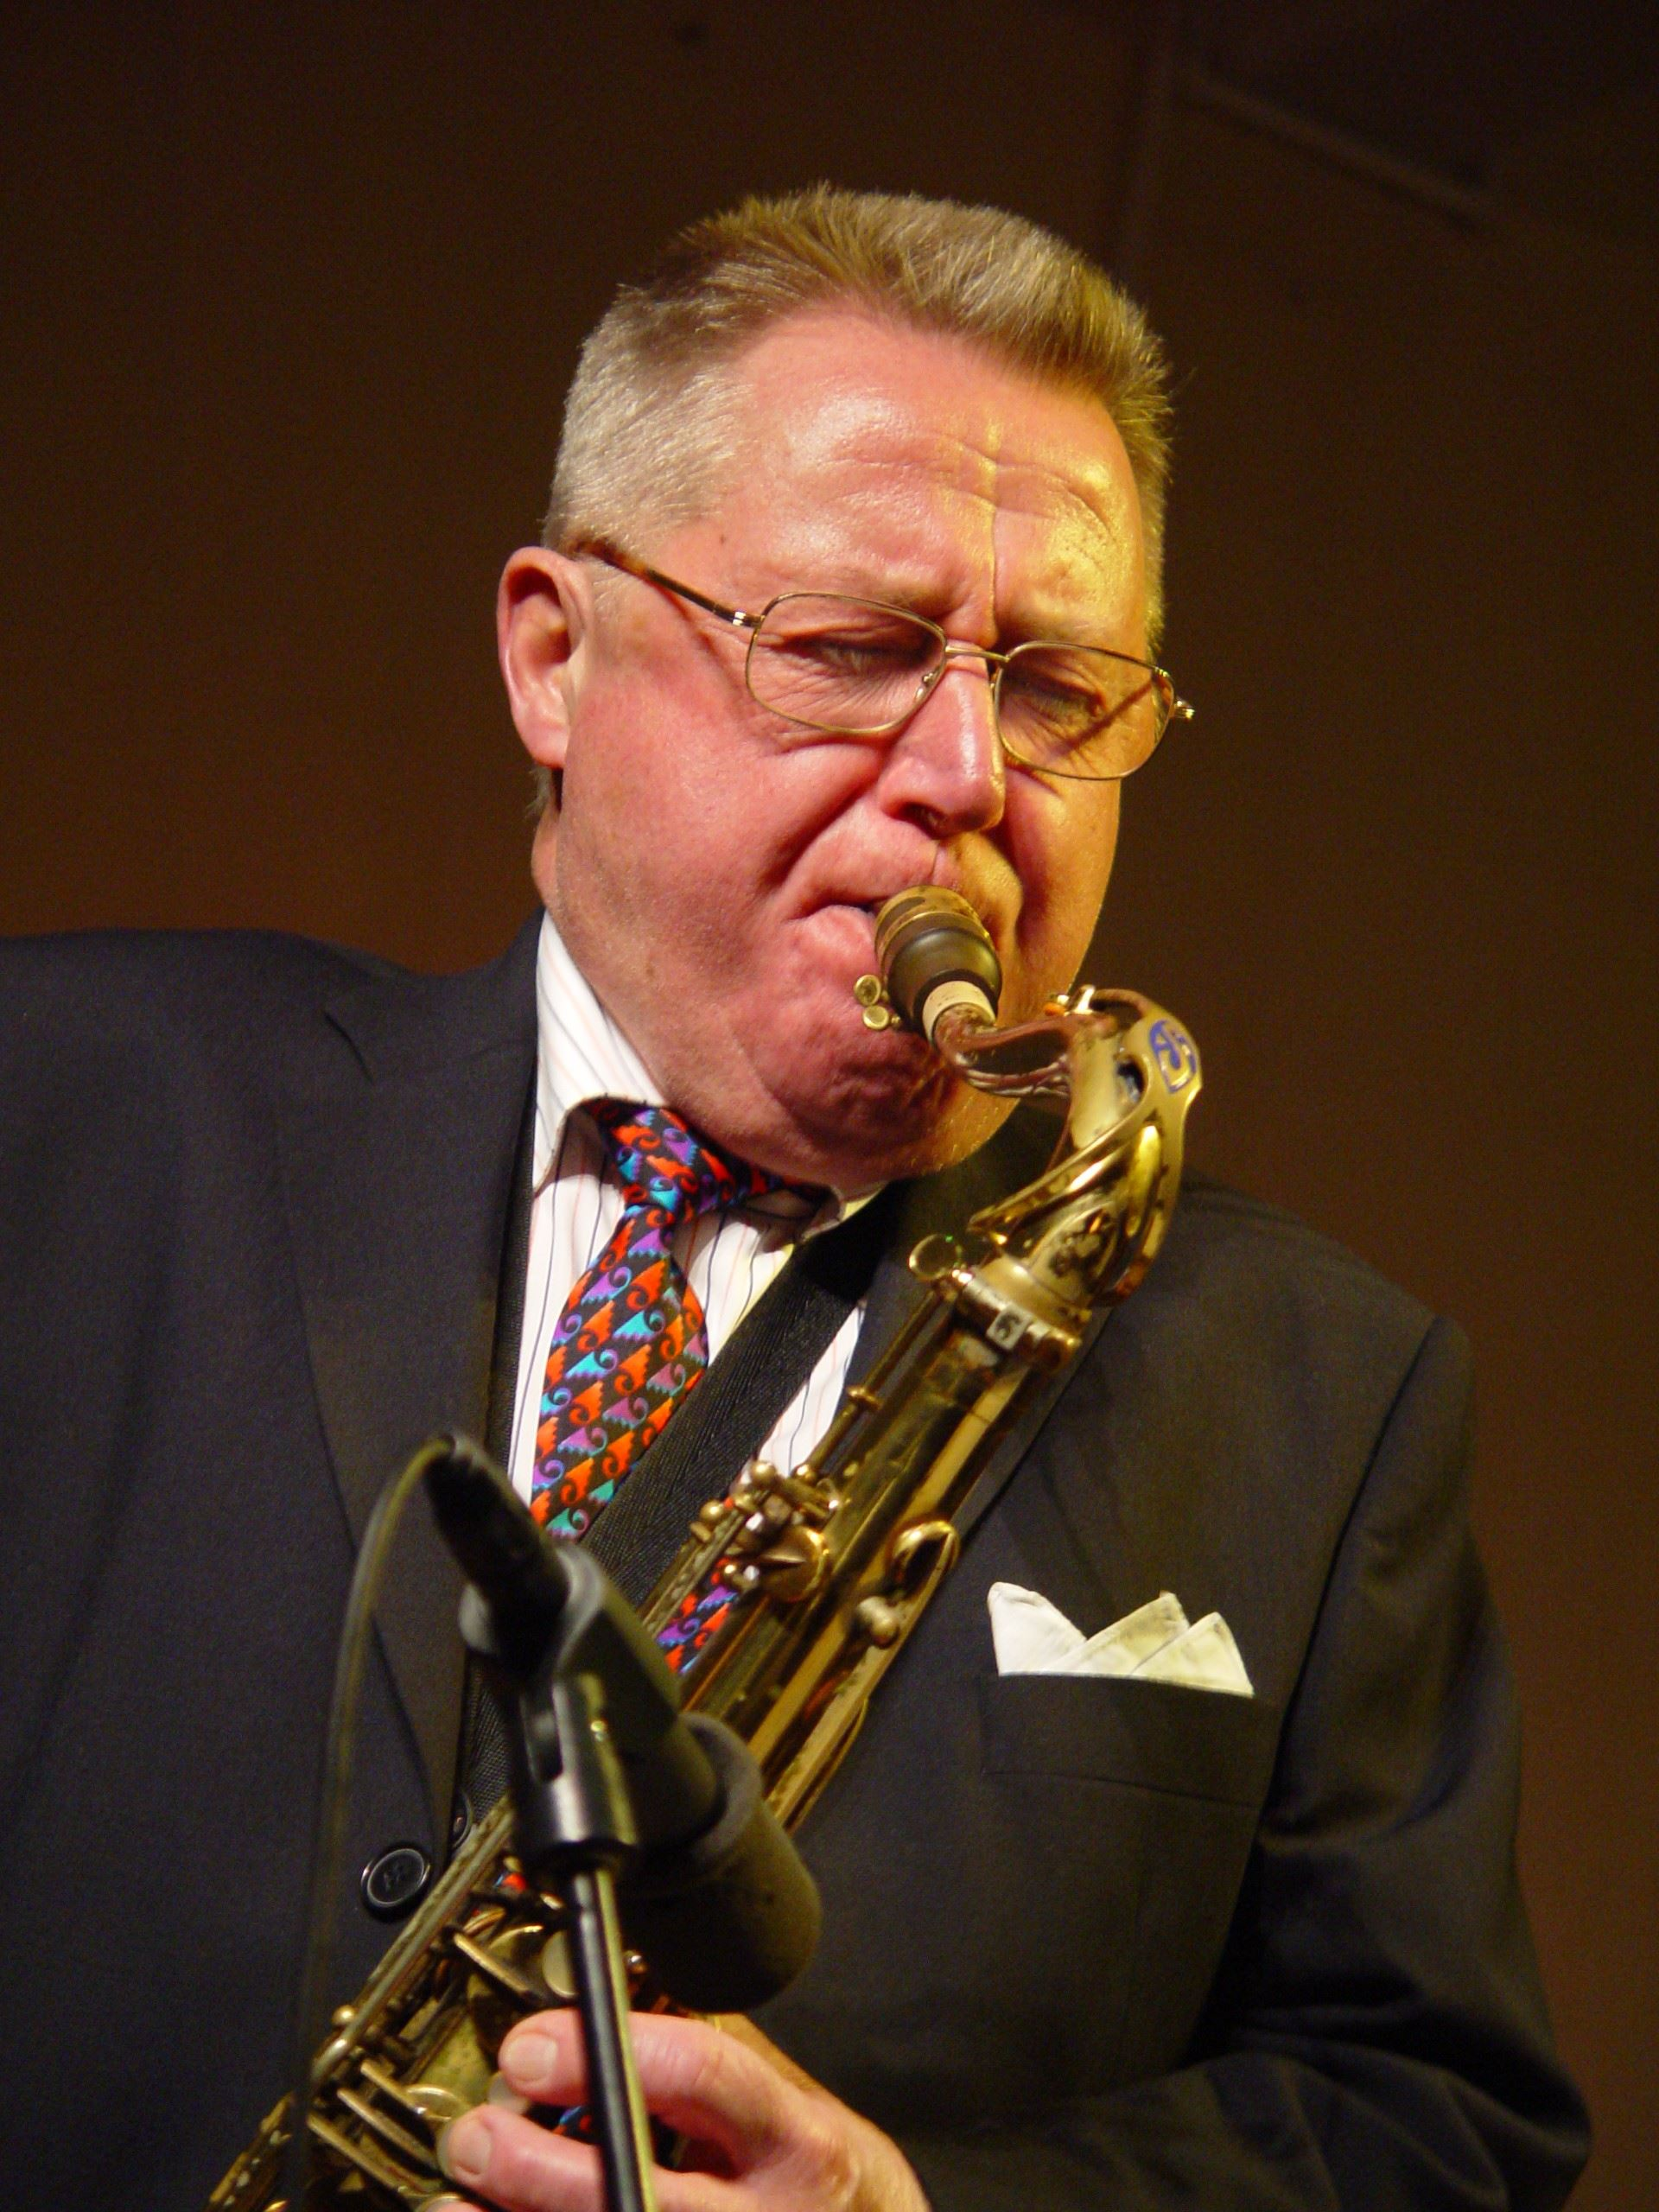 Jazz by Hacke Björksten and his band at Pub Bastun